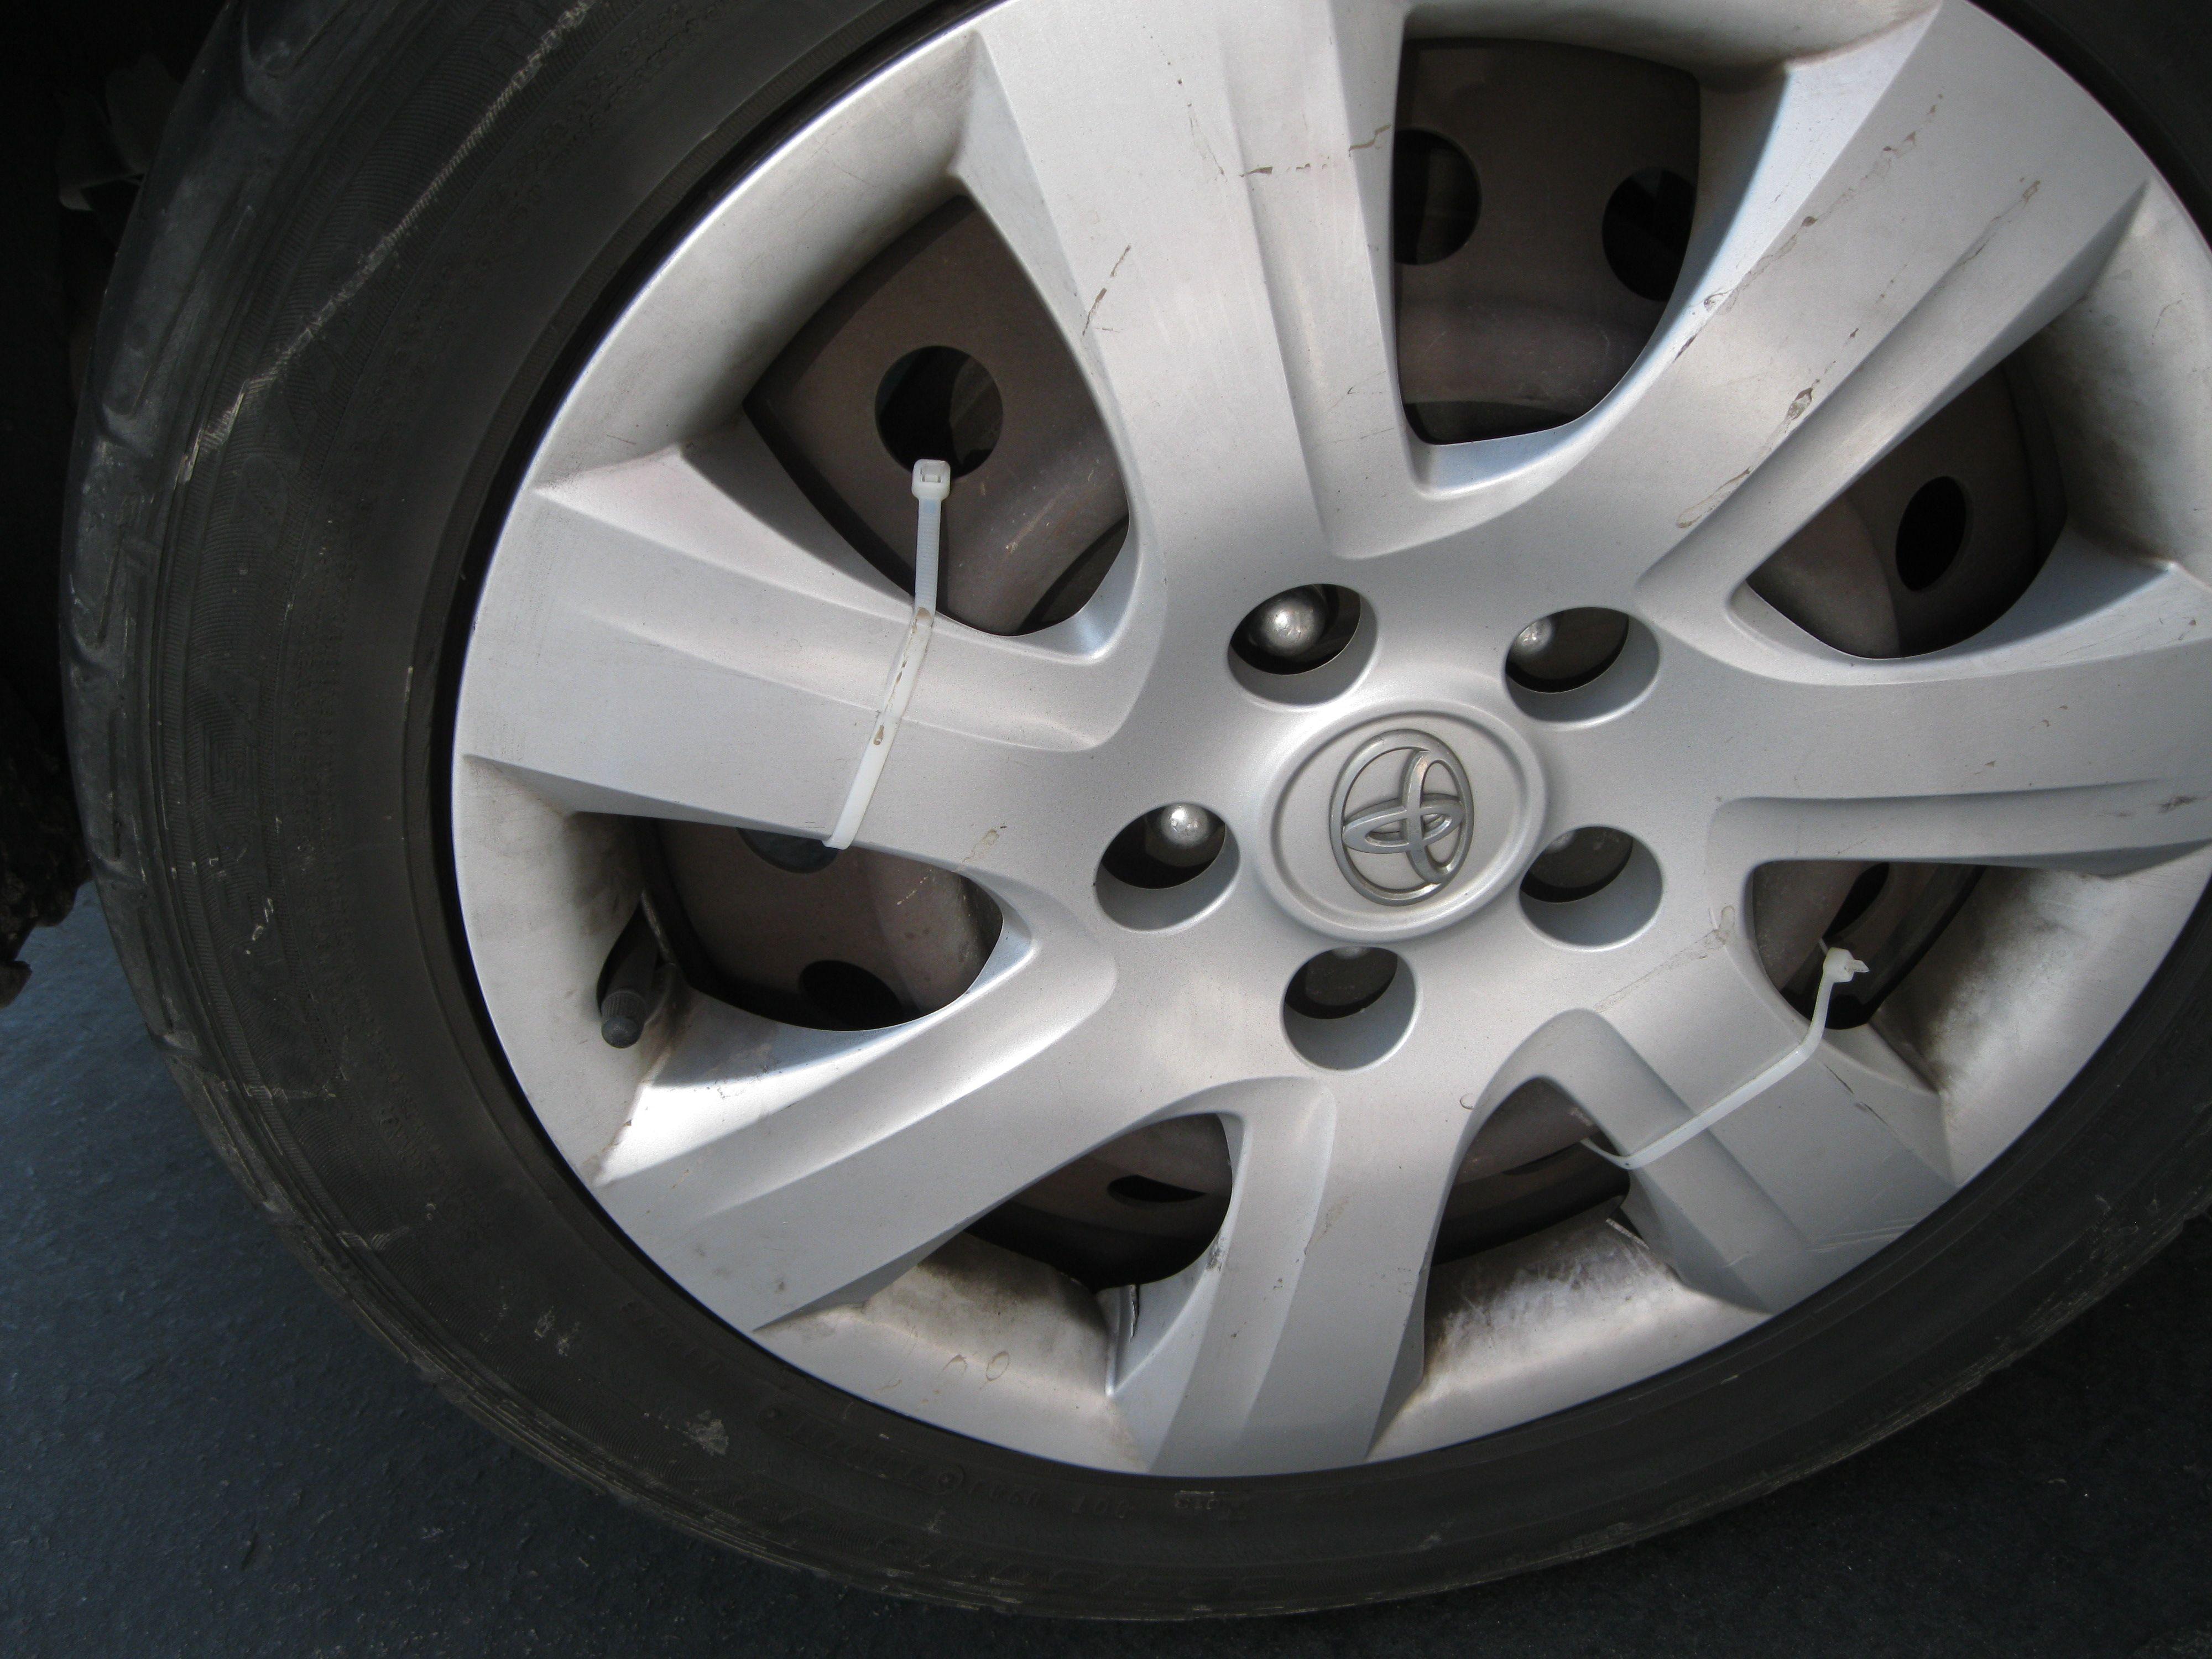 Zip ties keep plastic hubcaps in place.